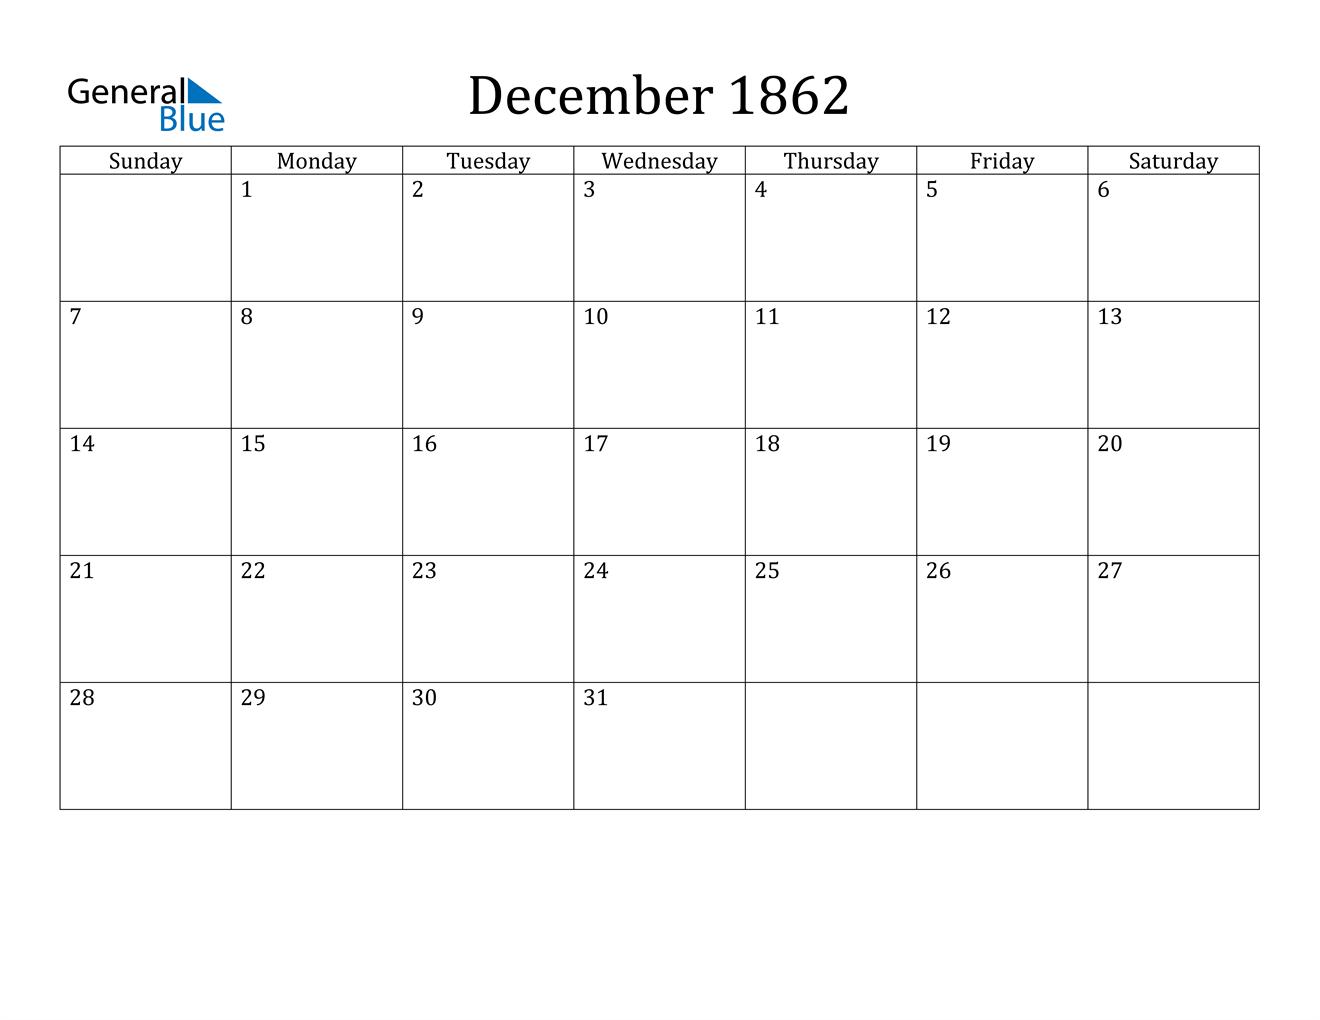 Image of December 1862 Calendar